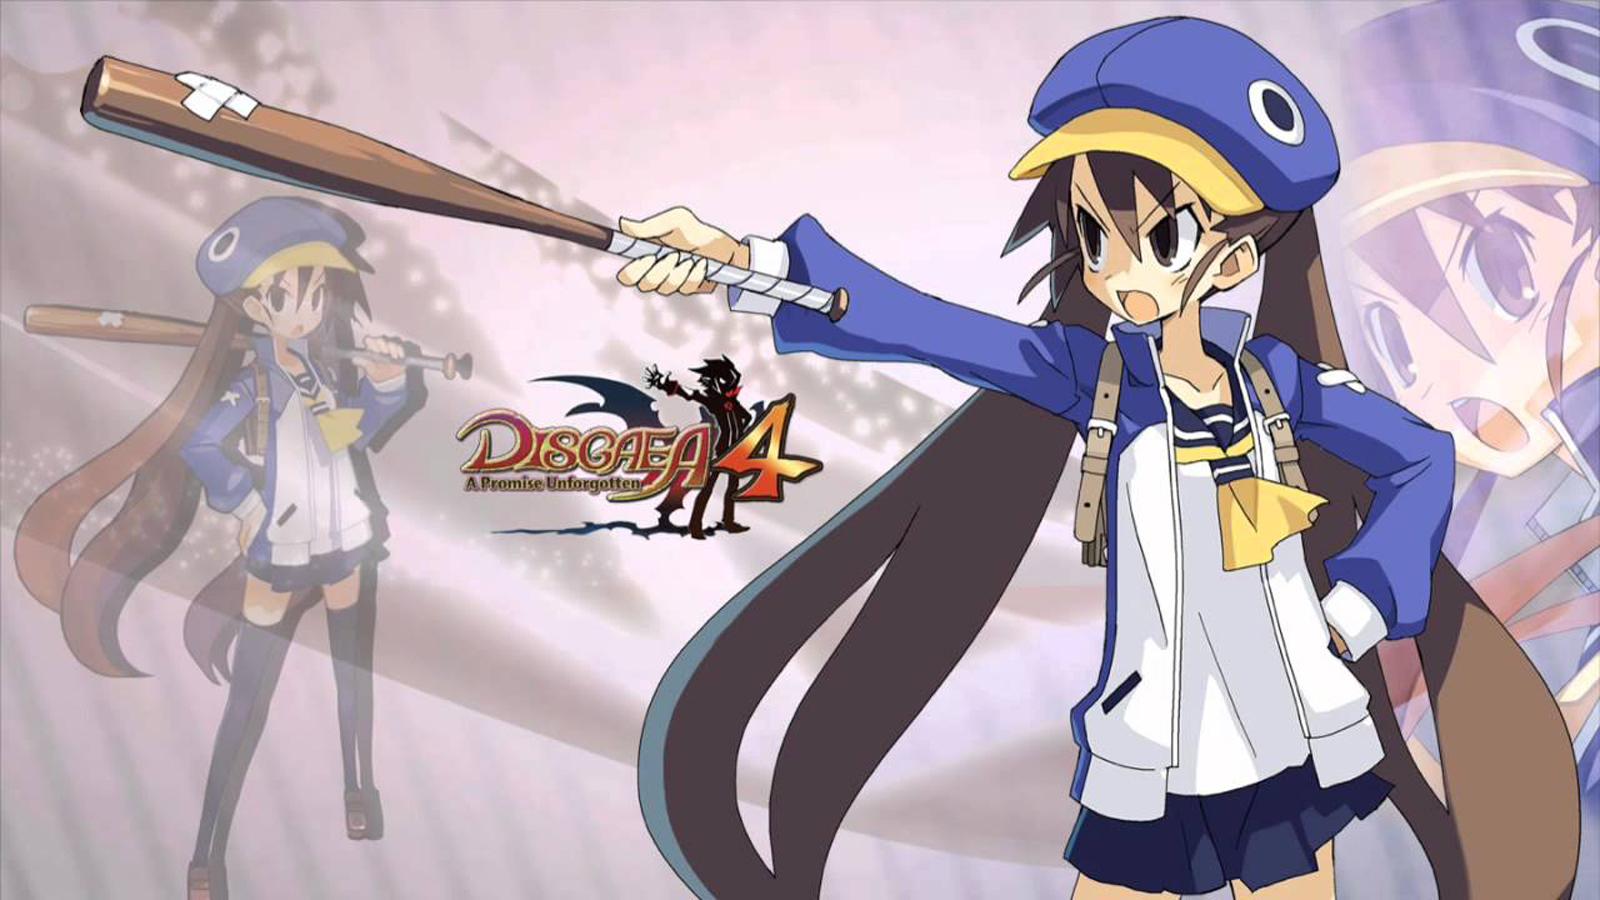 Disgaea 4: A Promise Unforgotten: Fuka Kazamatsuri